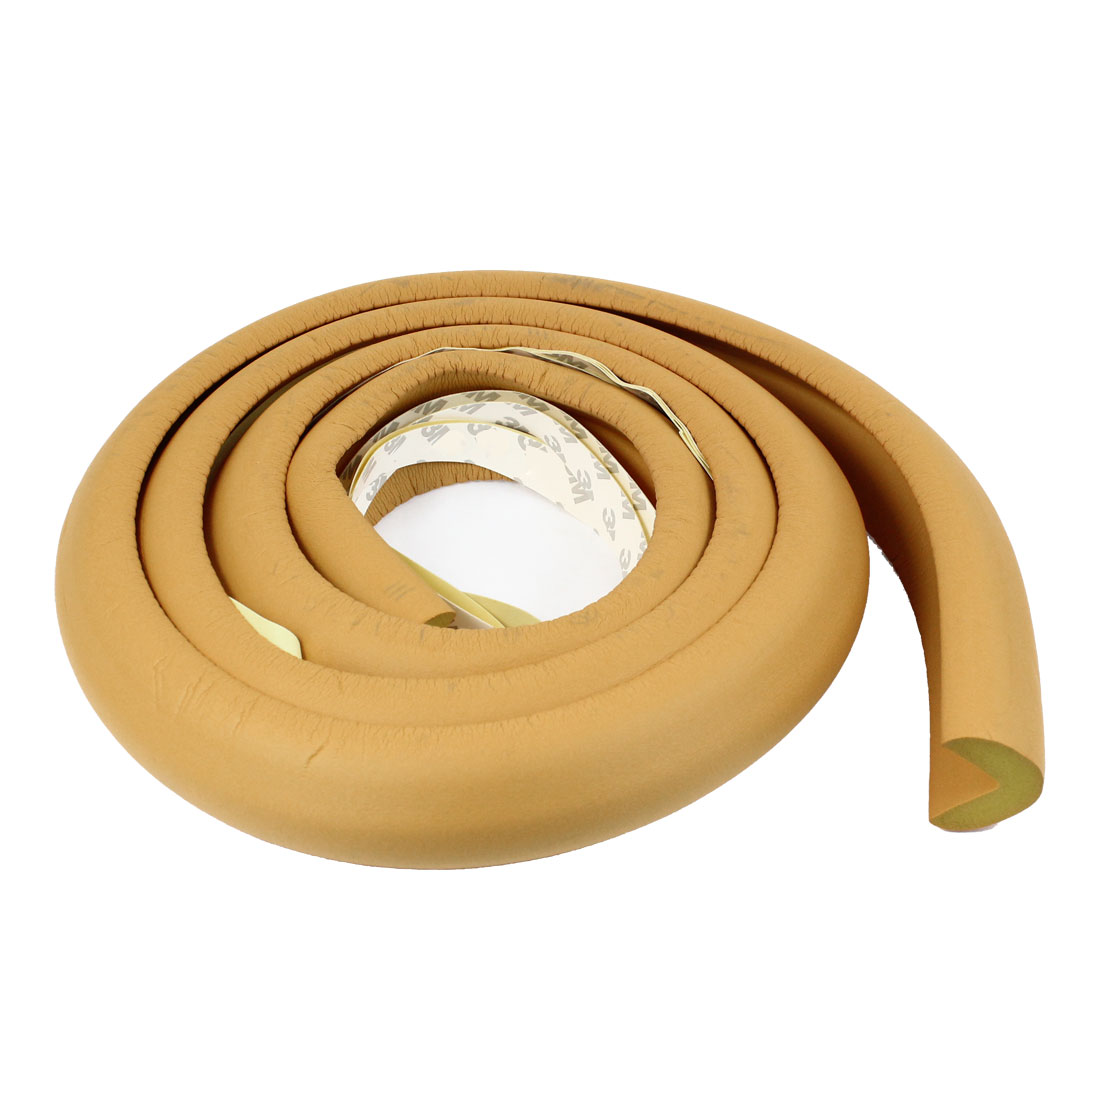 Furniture Desk Table Edge Rim Corner Cushion Strip Pad Mat Cover Protector Yellow 2M